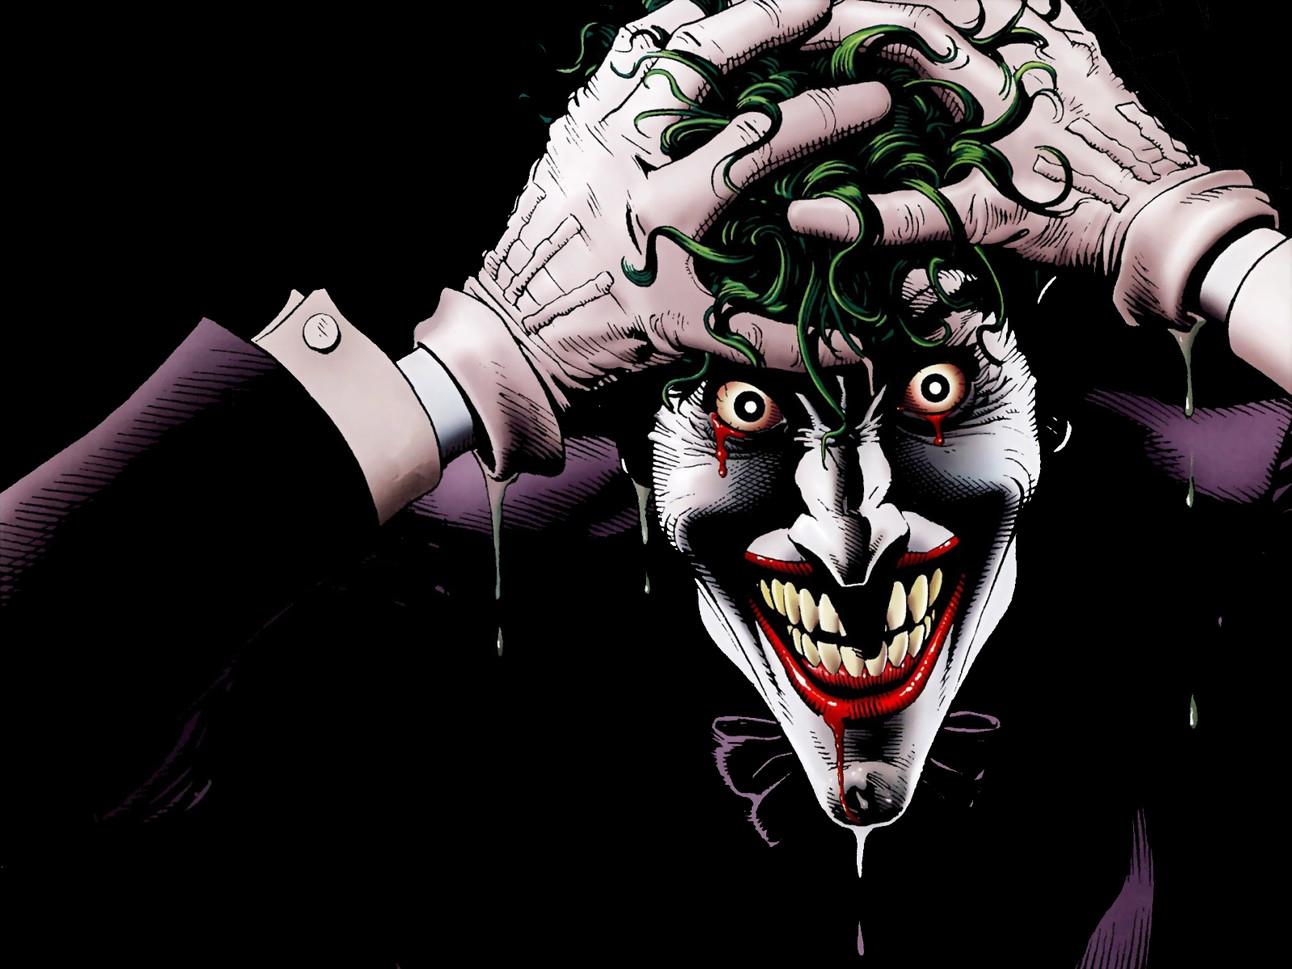 the-joker-is-mad.jpg